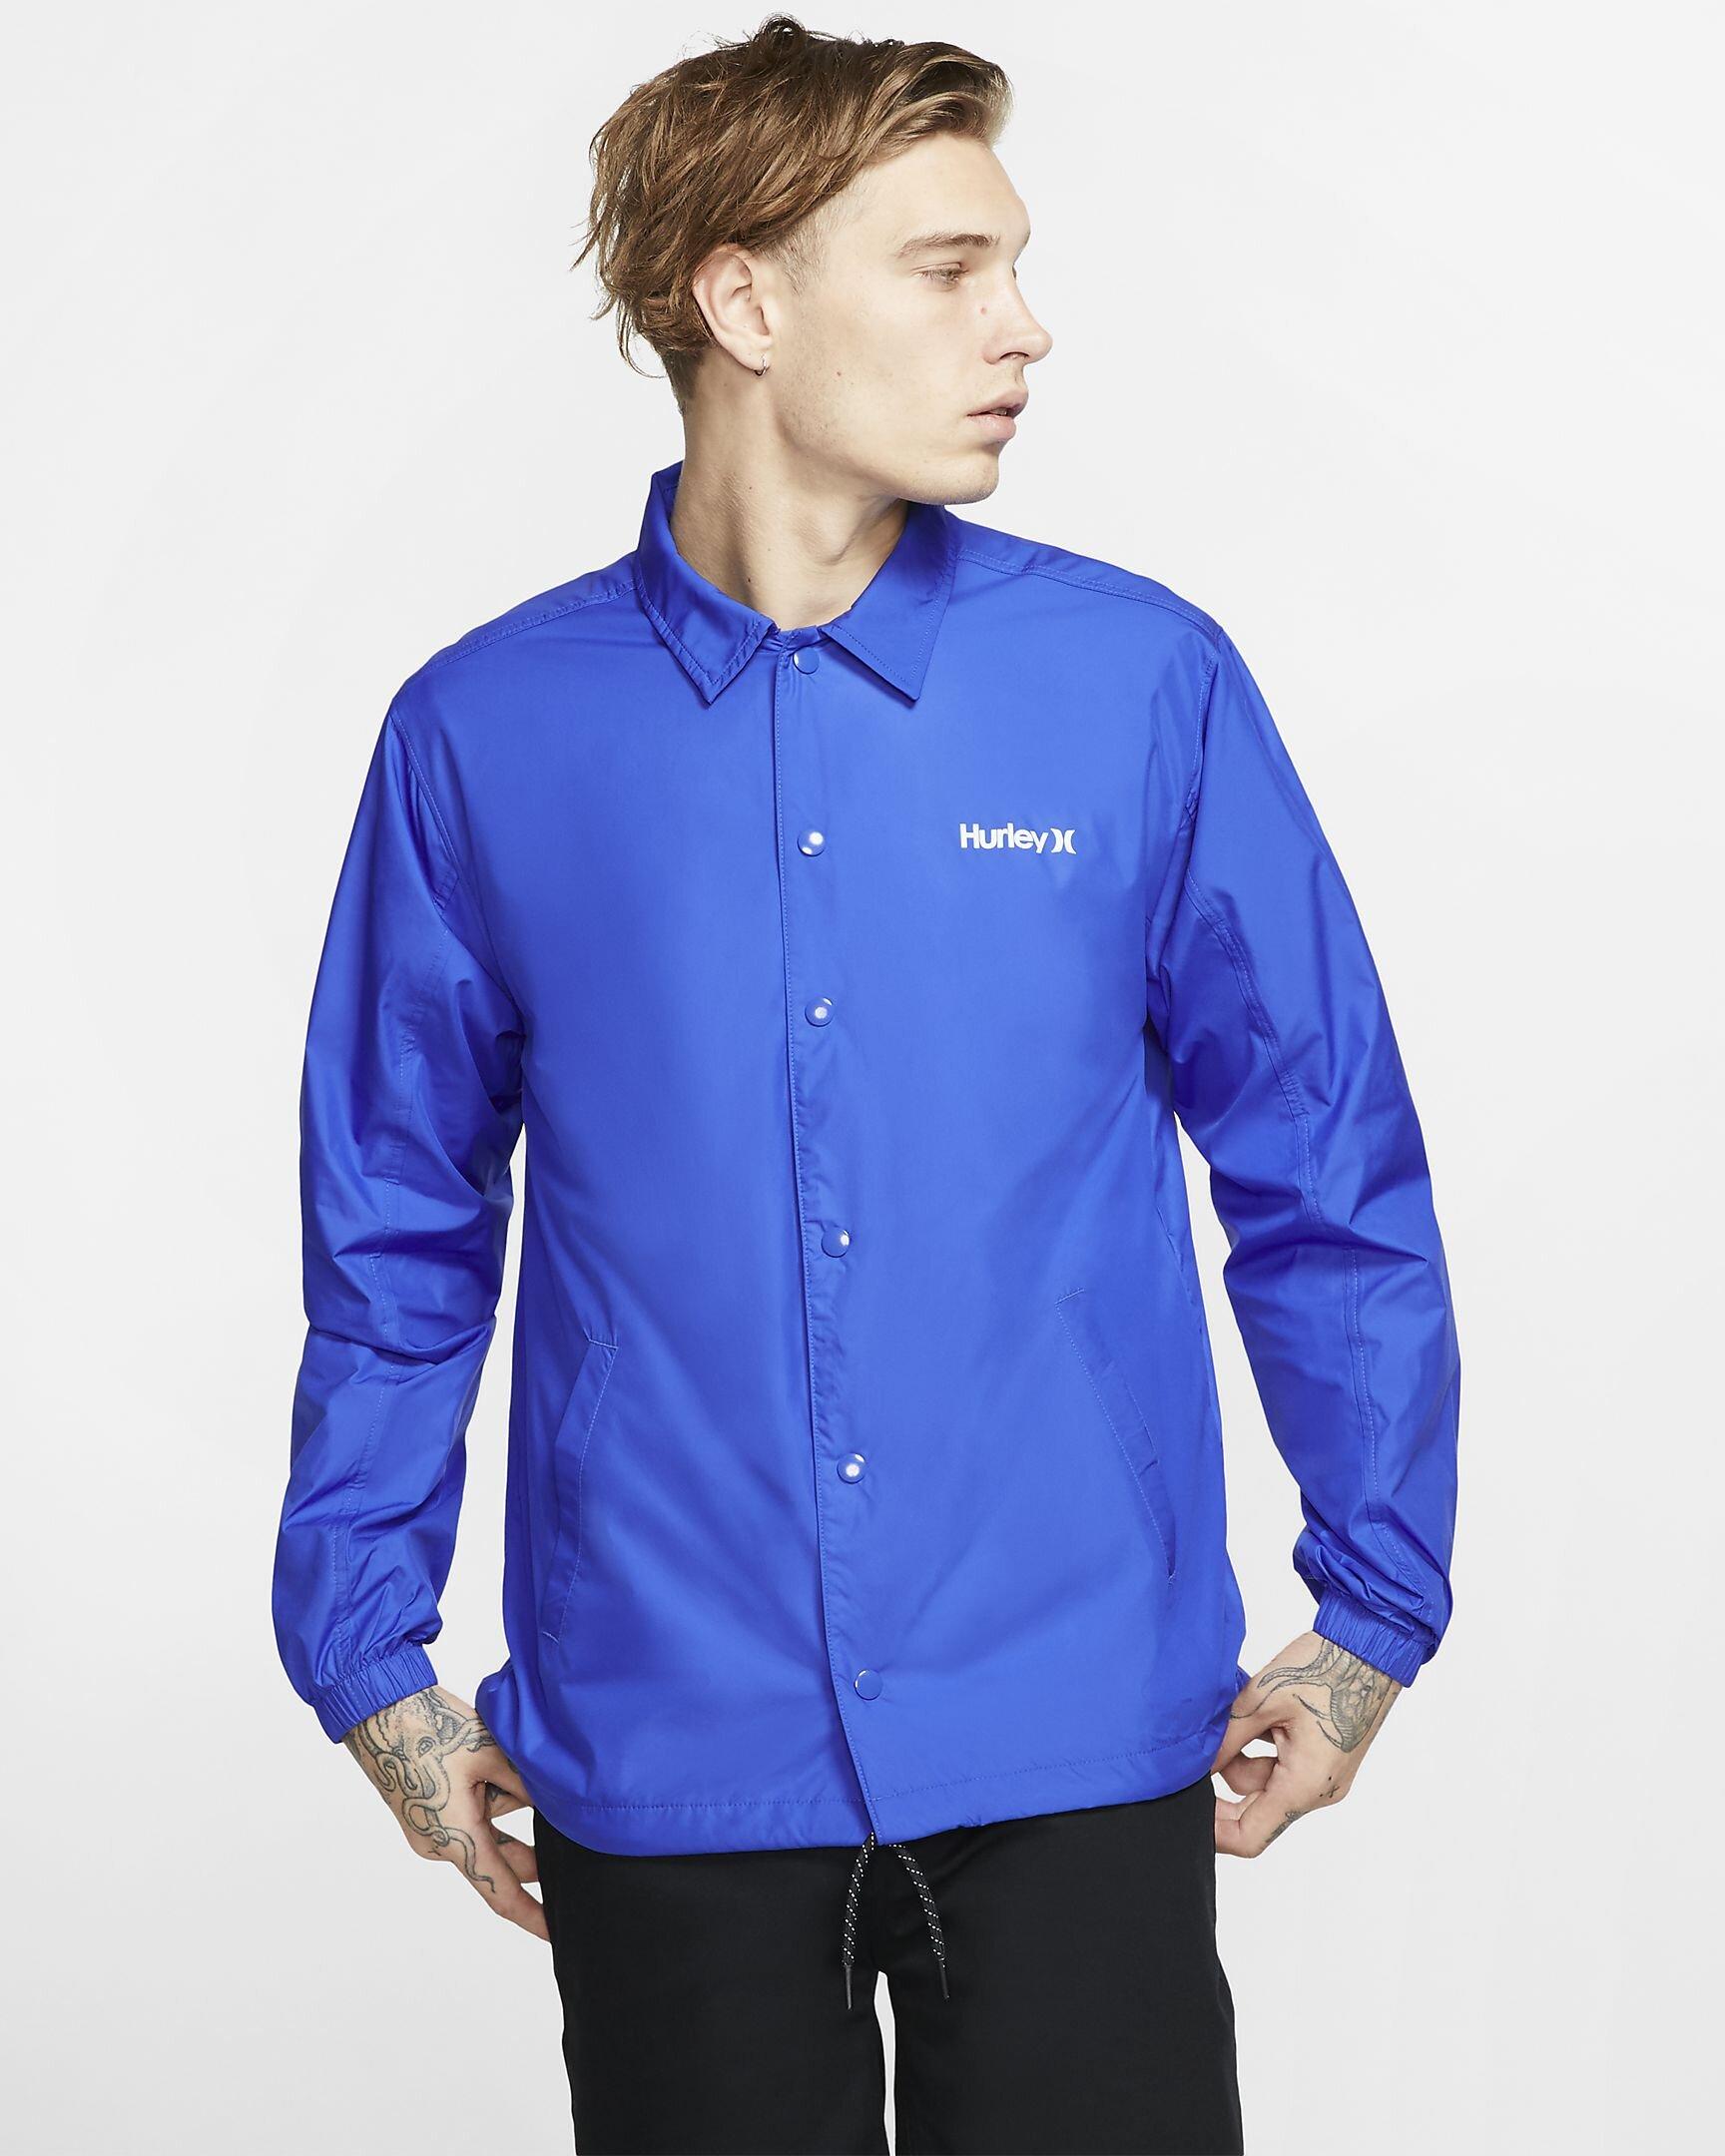 hurley-siege-coaches-mens-jacket-tp89wj.jpg